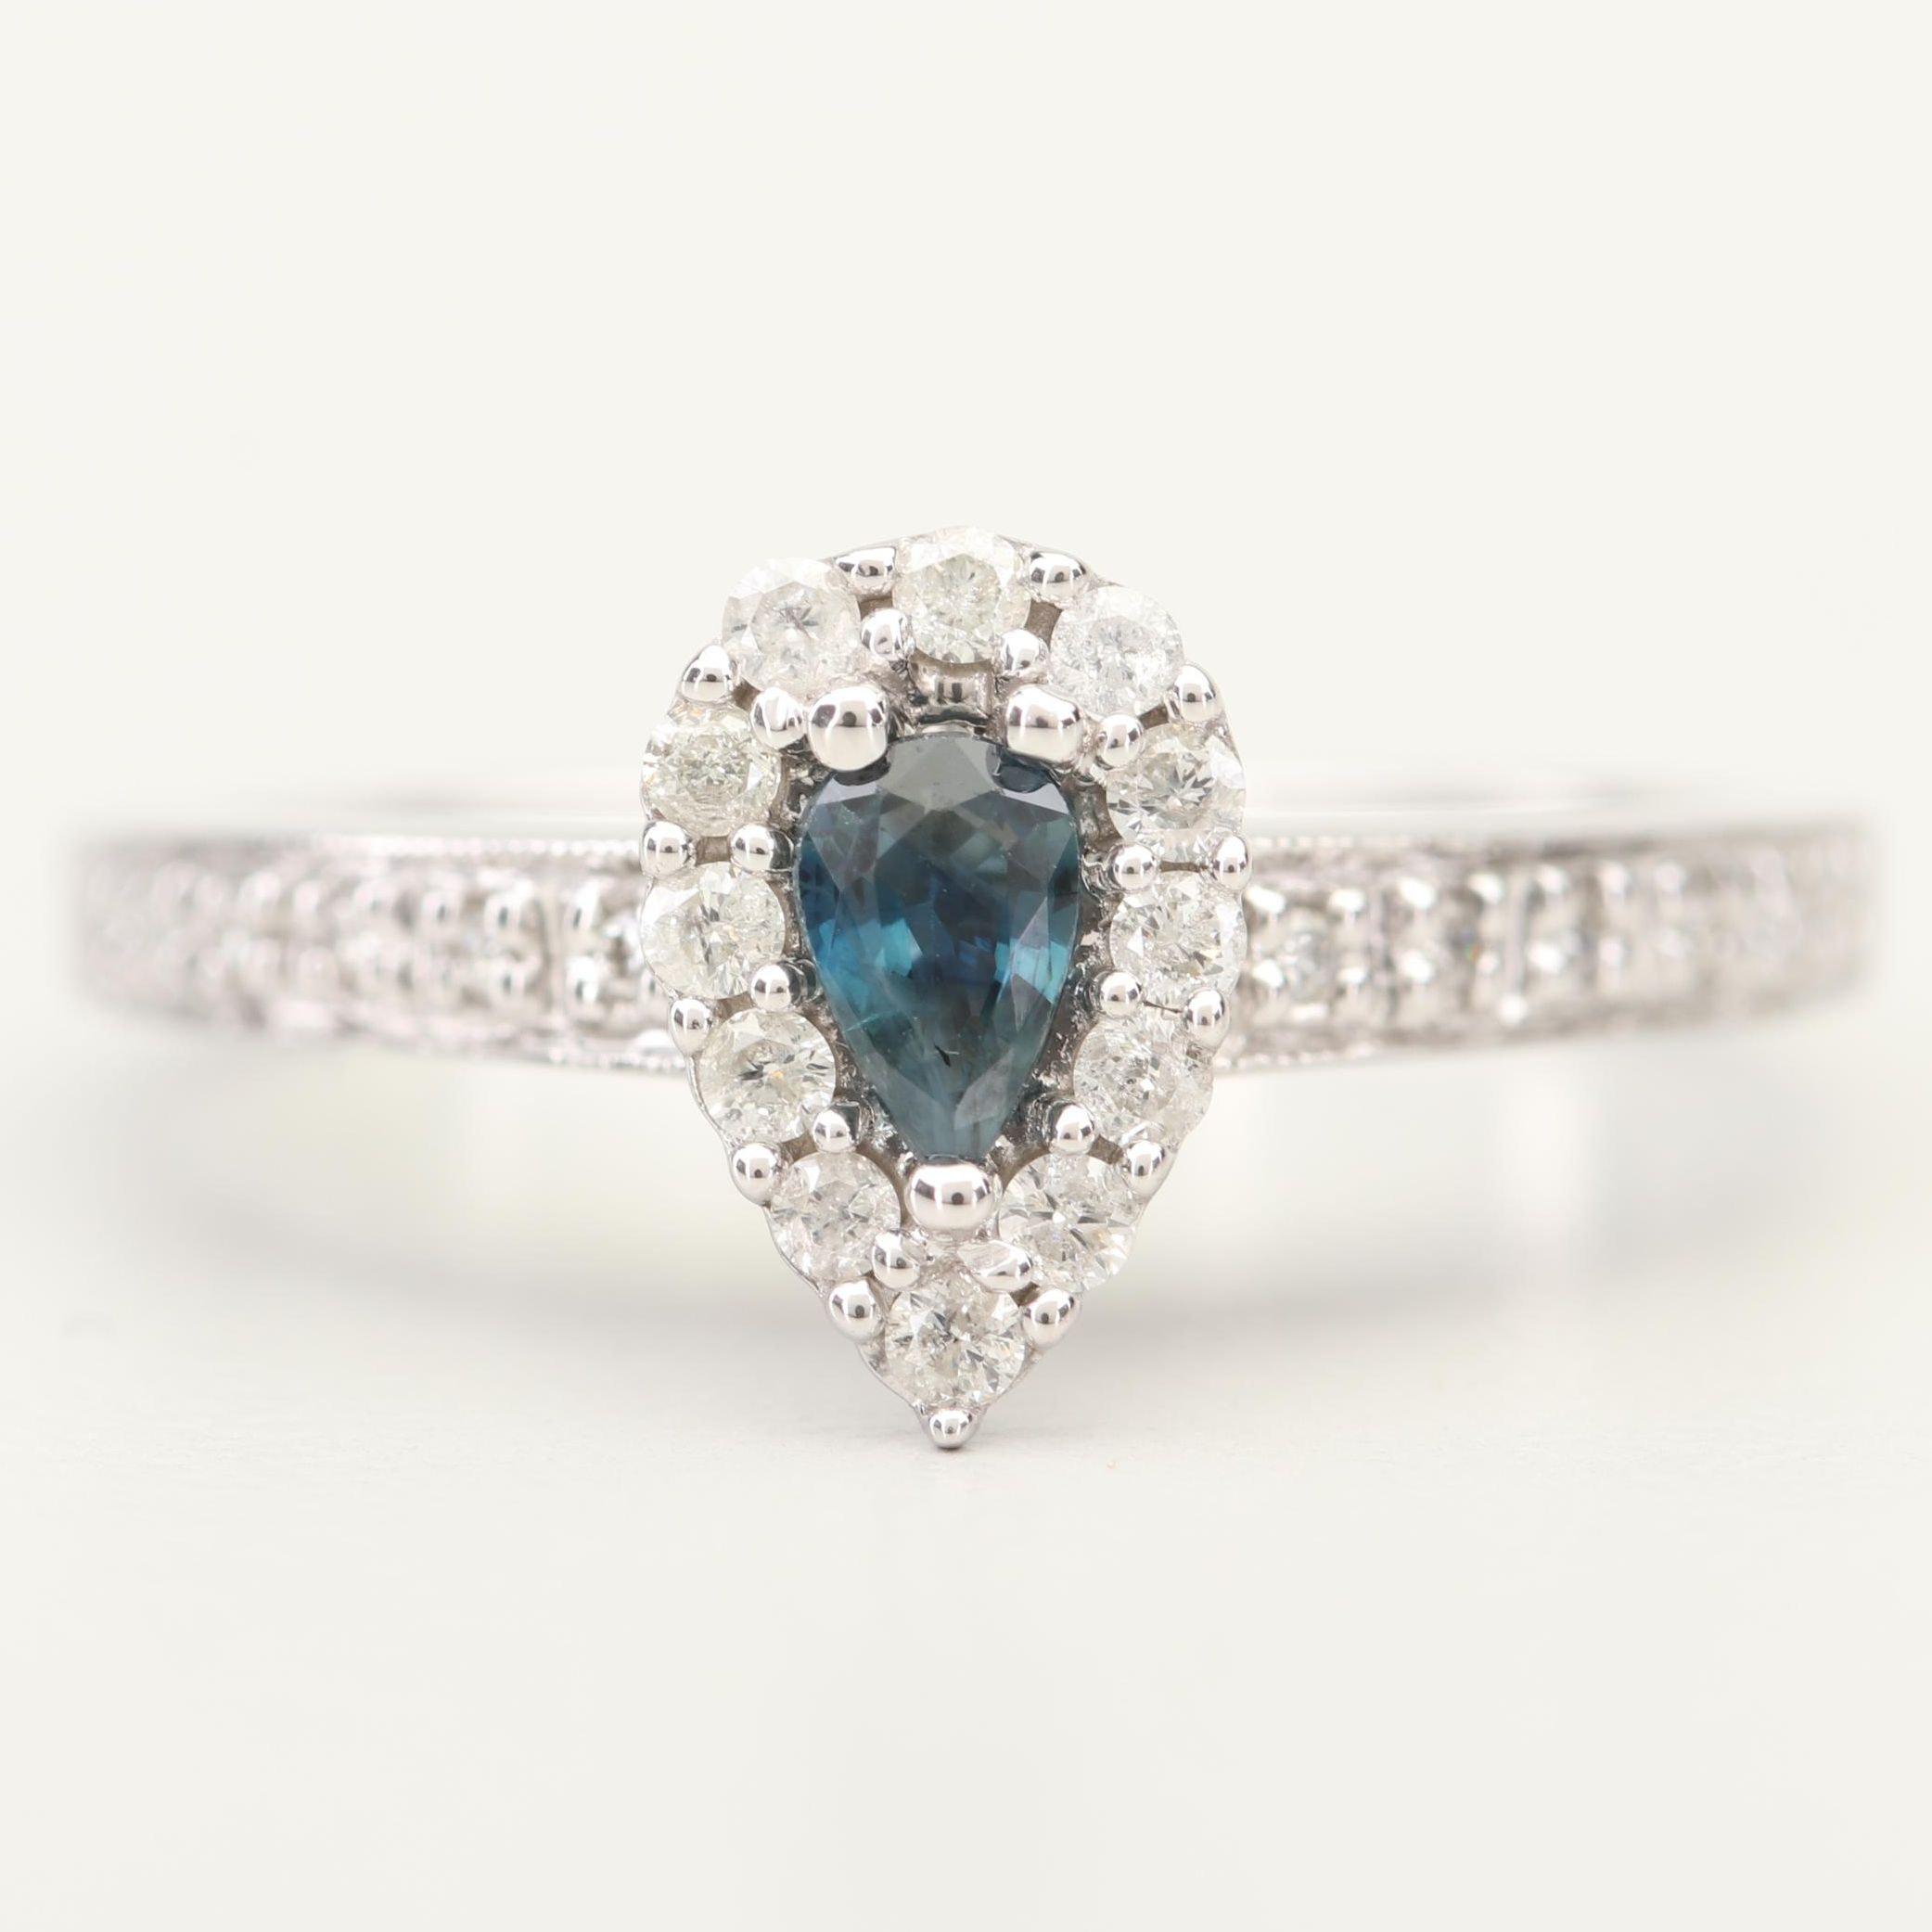 Keepsake 14K White Gold Sapphire and Diamond Ring